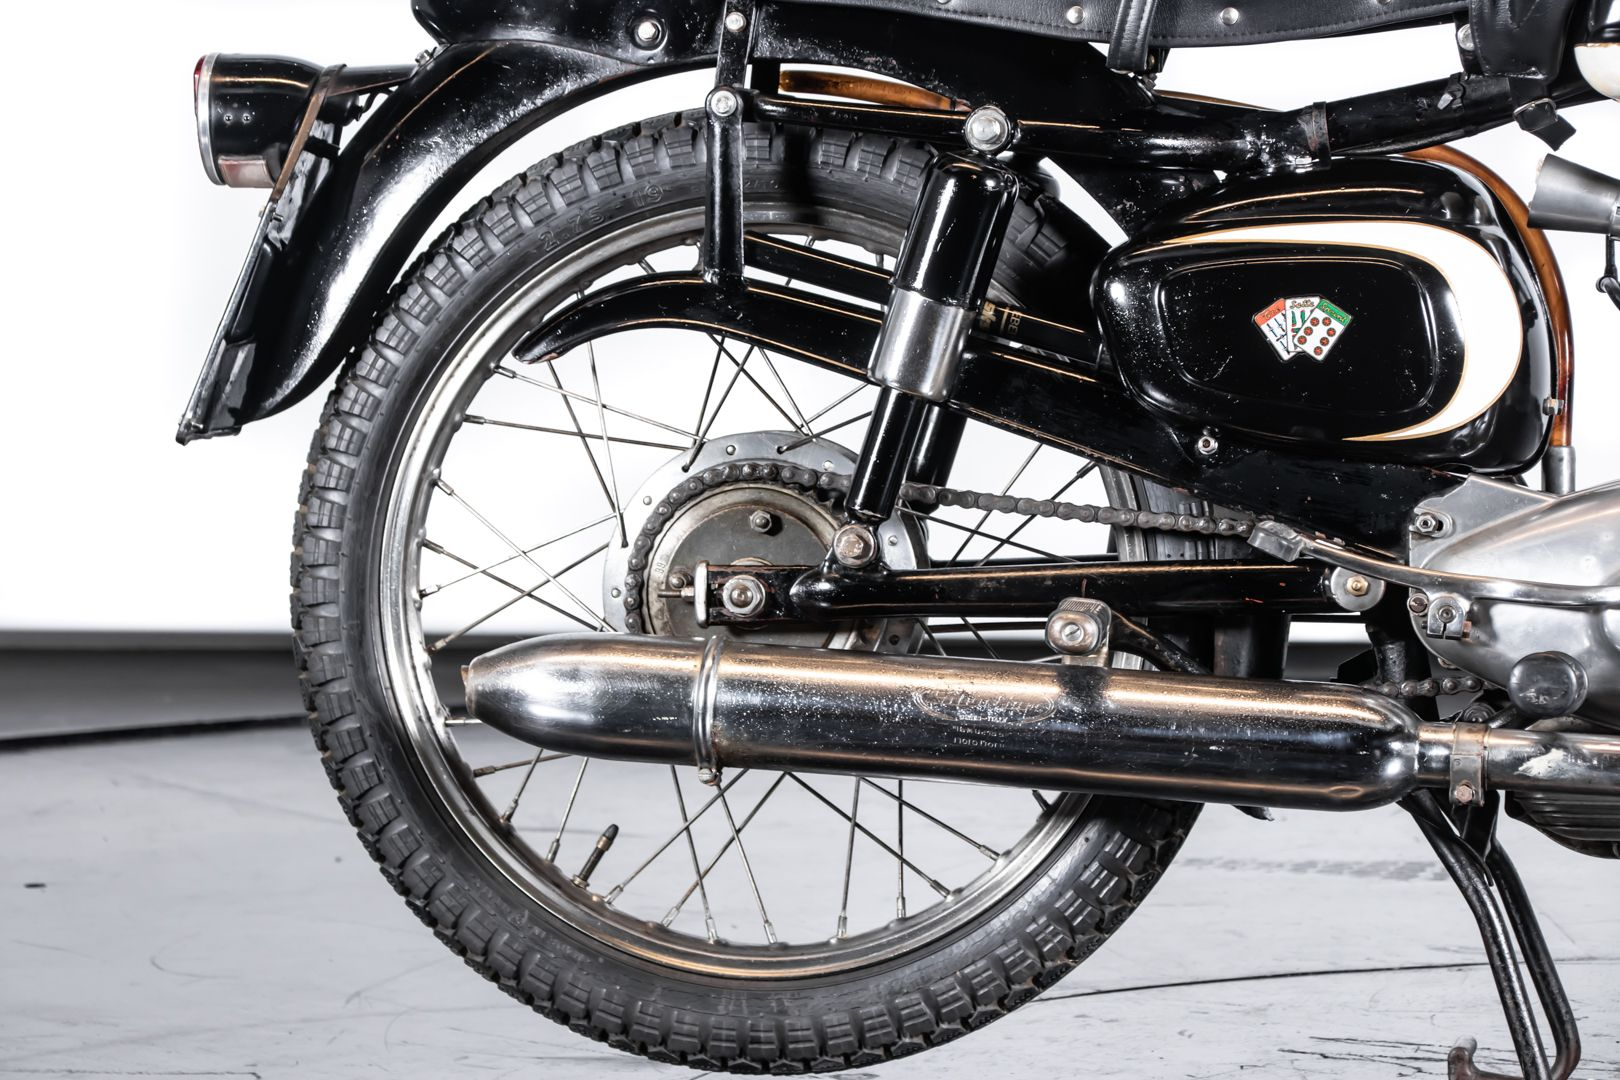 1960 Moto Morini Tresette Sprint 175 76466